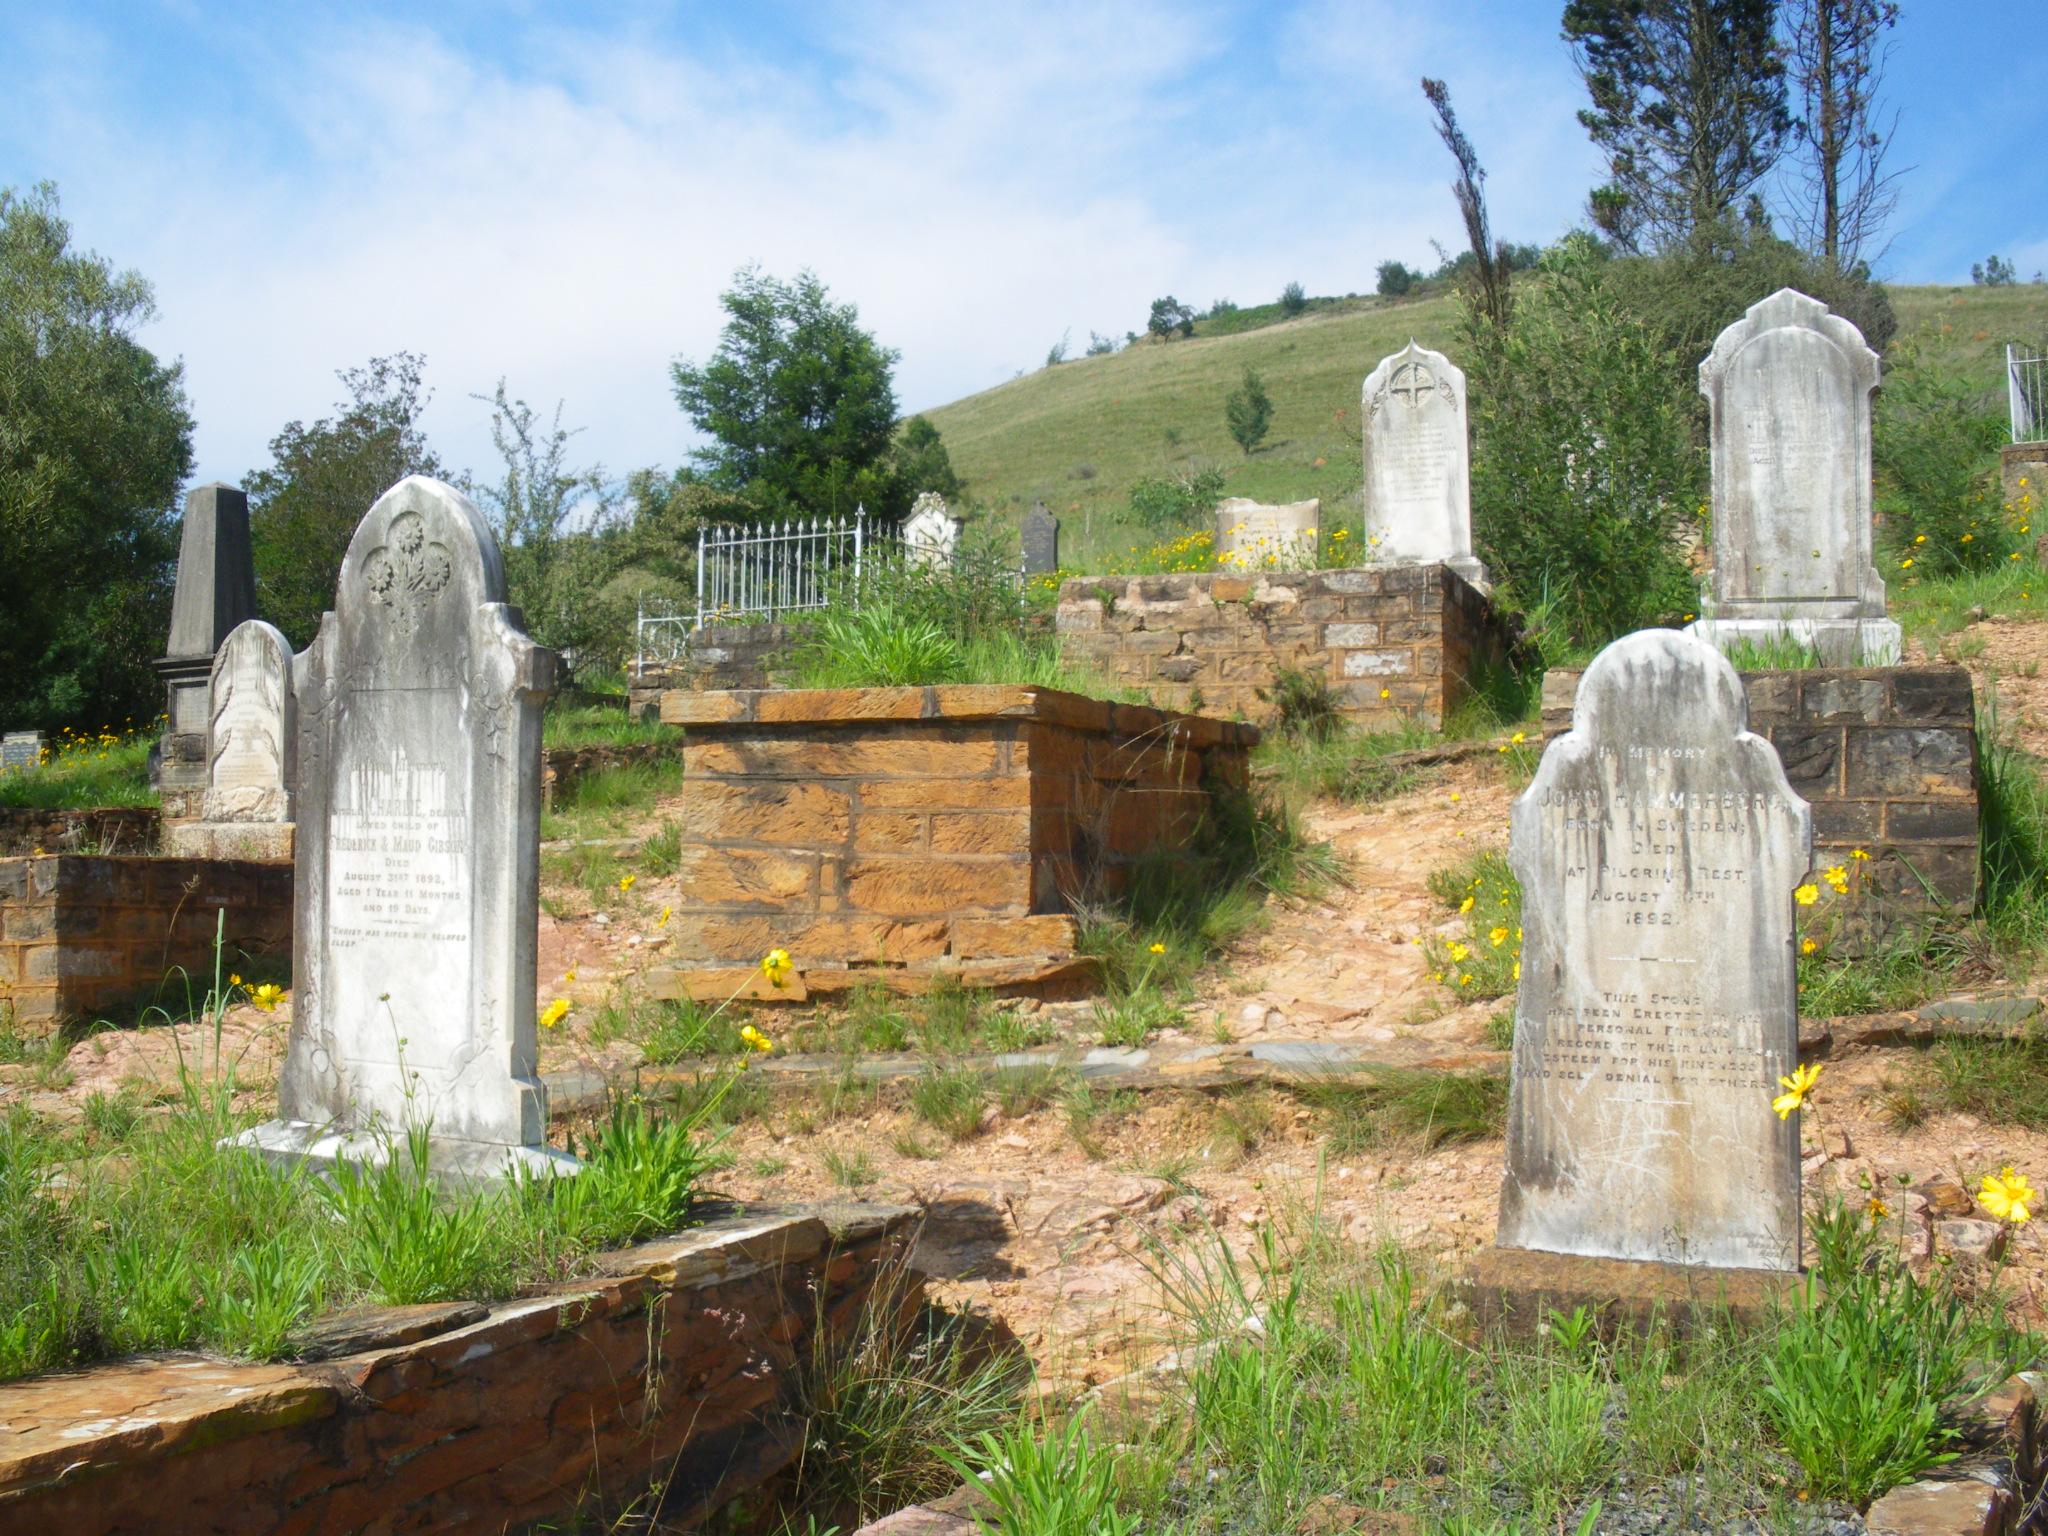 Pilgrims Rest Cemetery Ormond Beach Florida